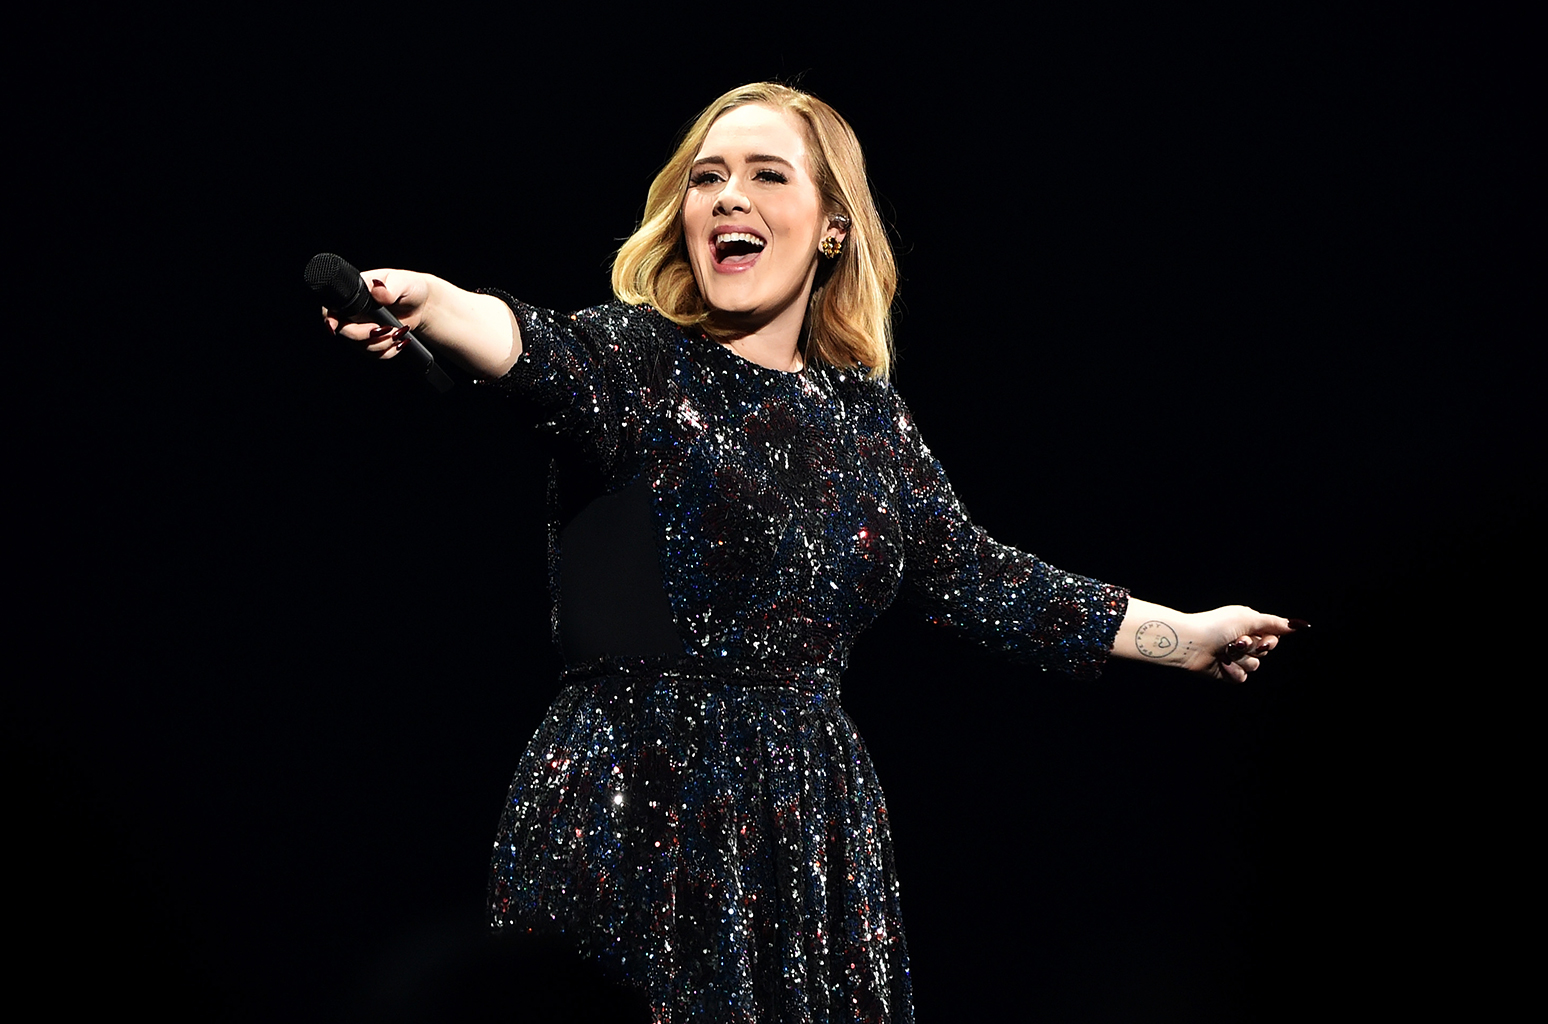 Mariah, κοίτα την Adele και κράτα σημειώσεις